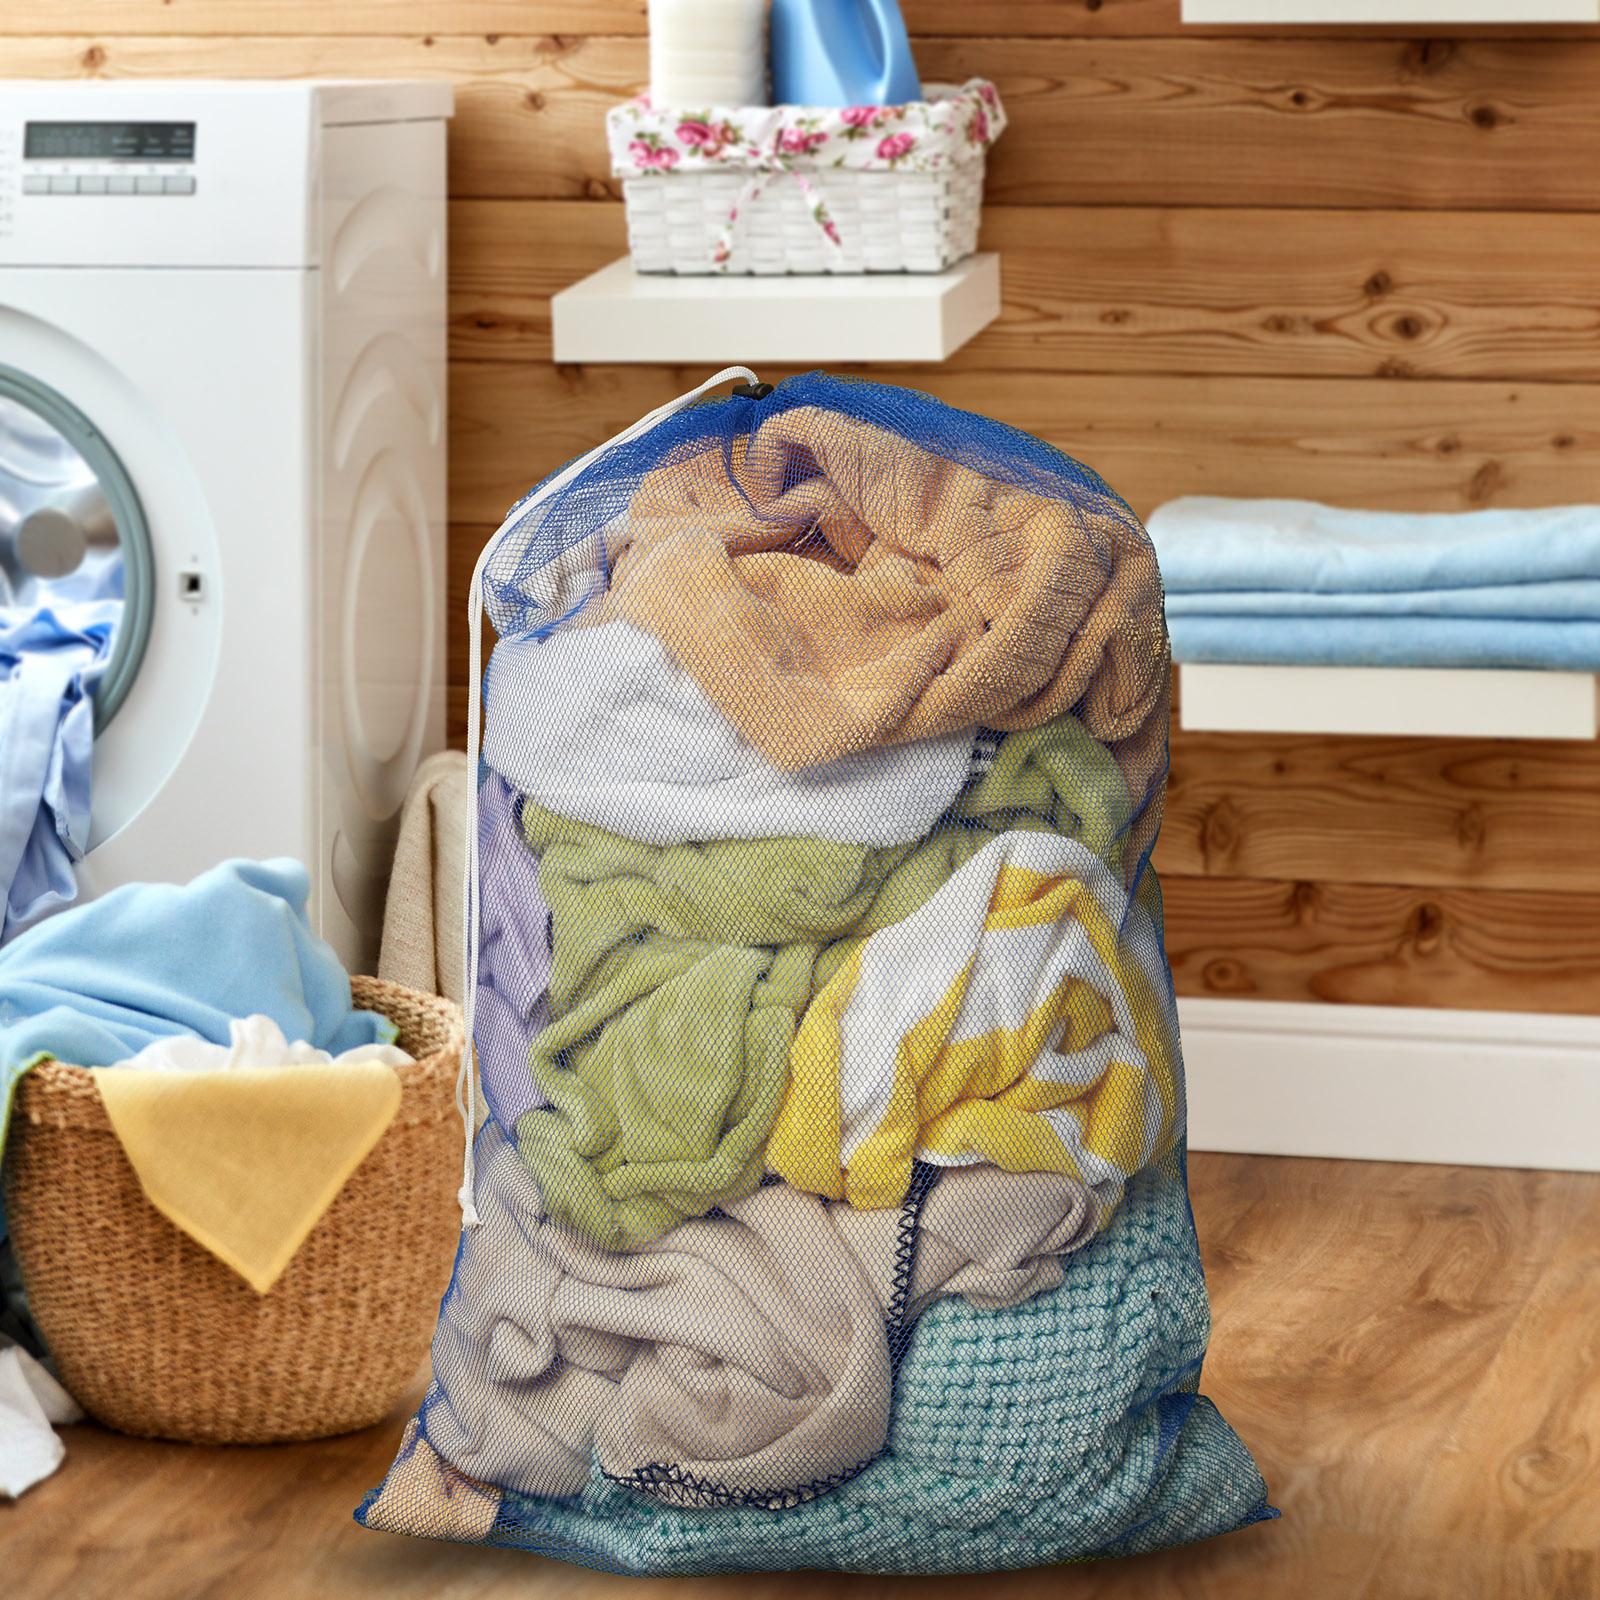 24-034-x-36-034-Large-Heavy-Duty-Mesh-Net-Drawstring-Laundry-or-Equipment-Ball-Bag thumbnail 13